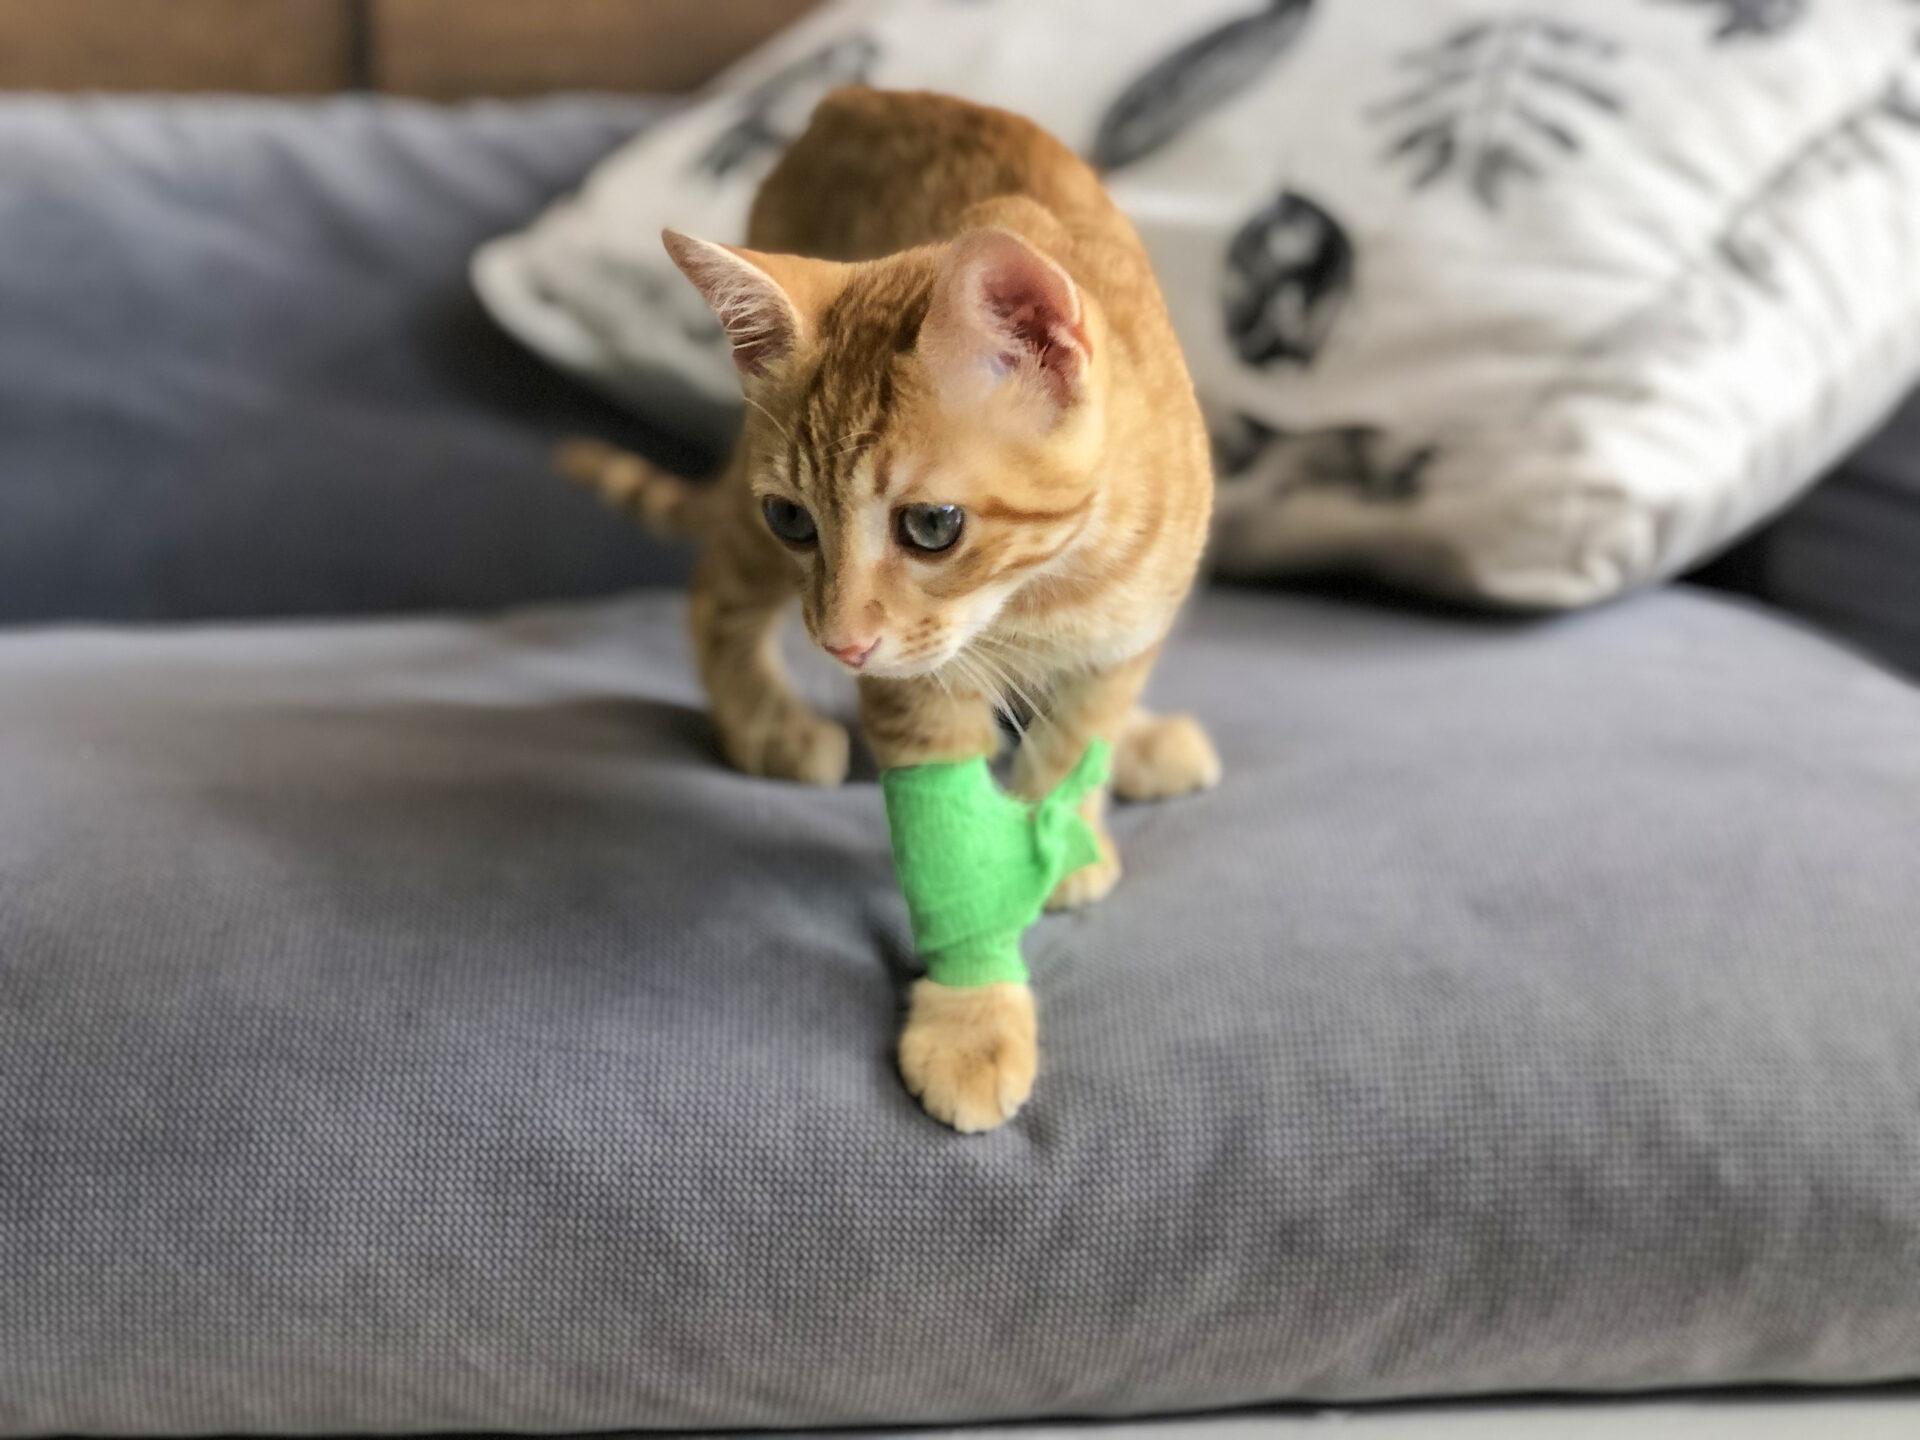 Cute injured kitten